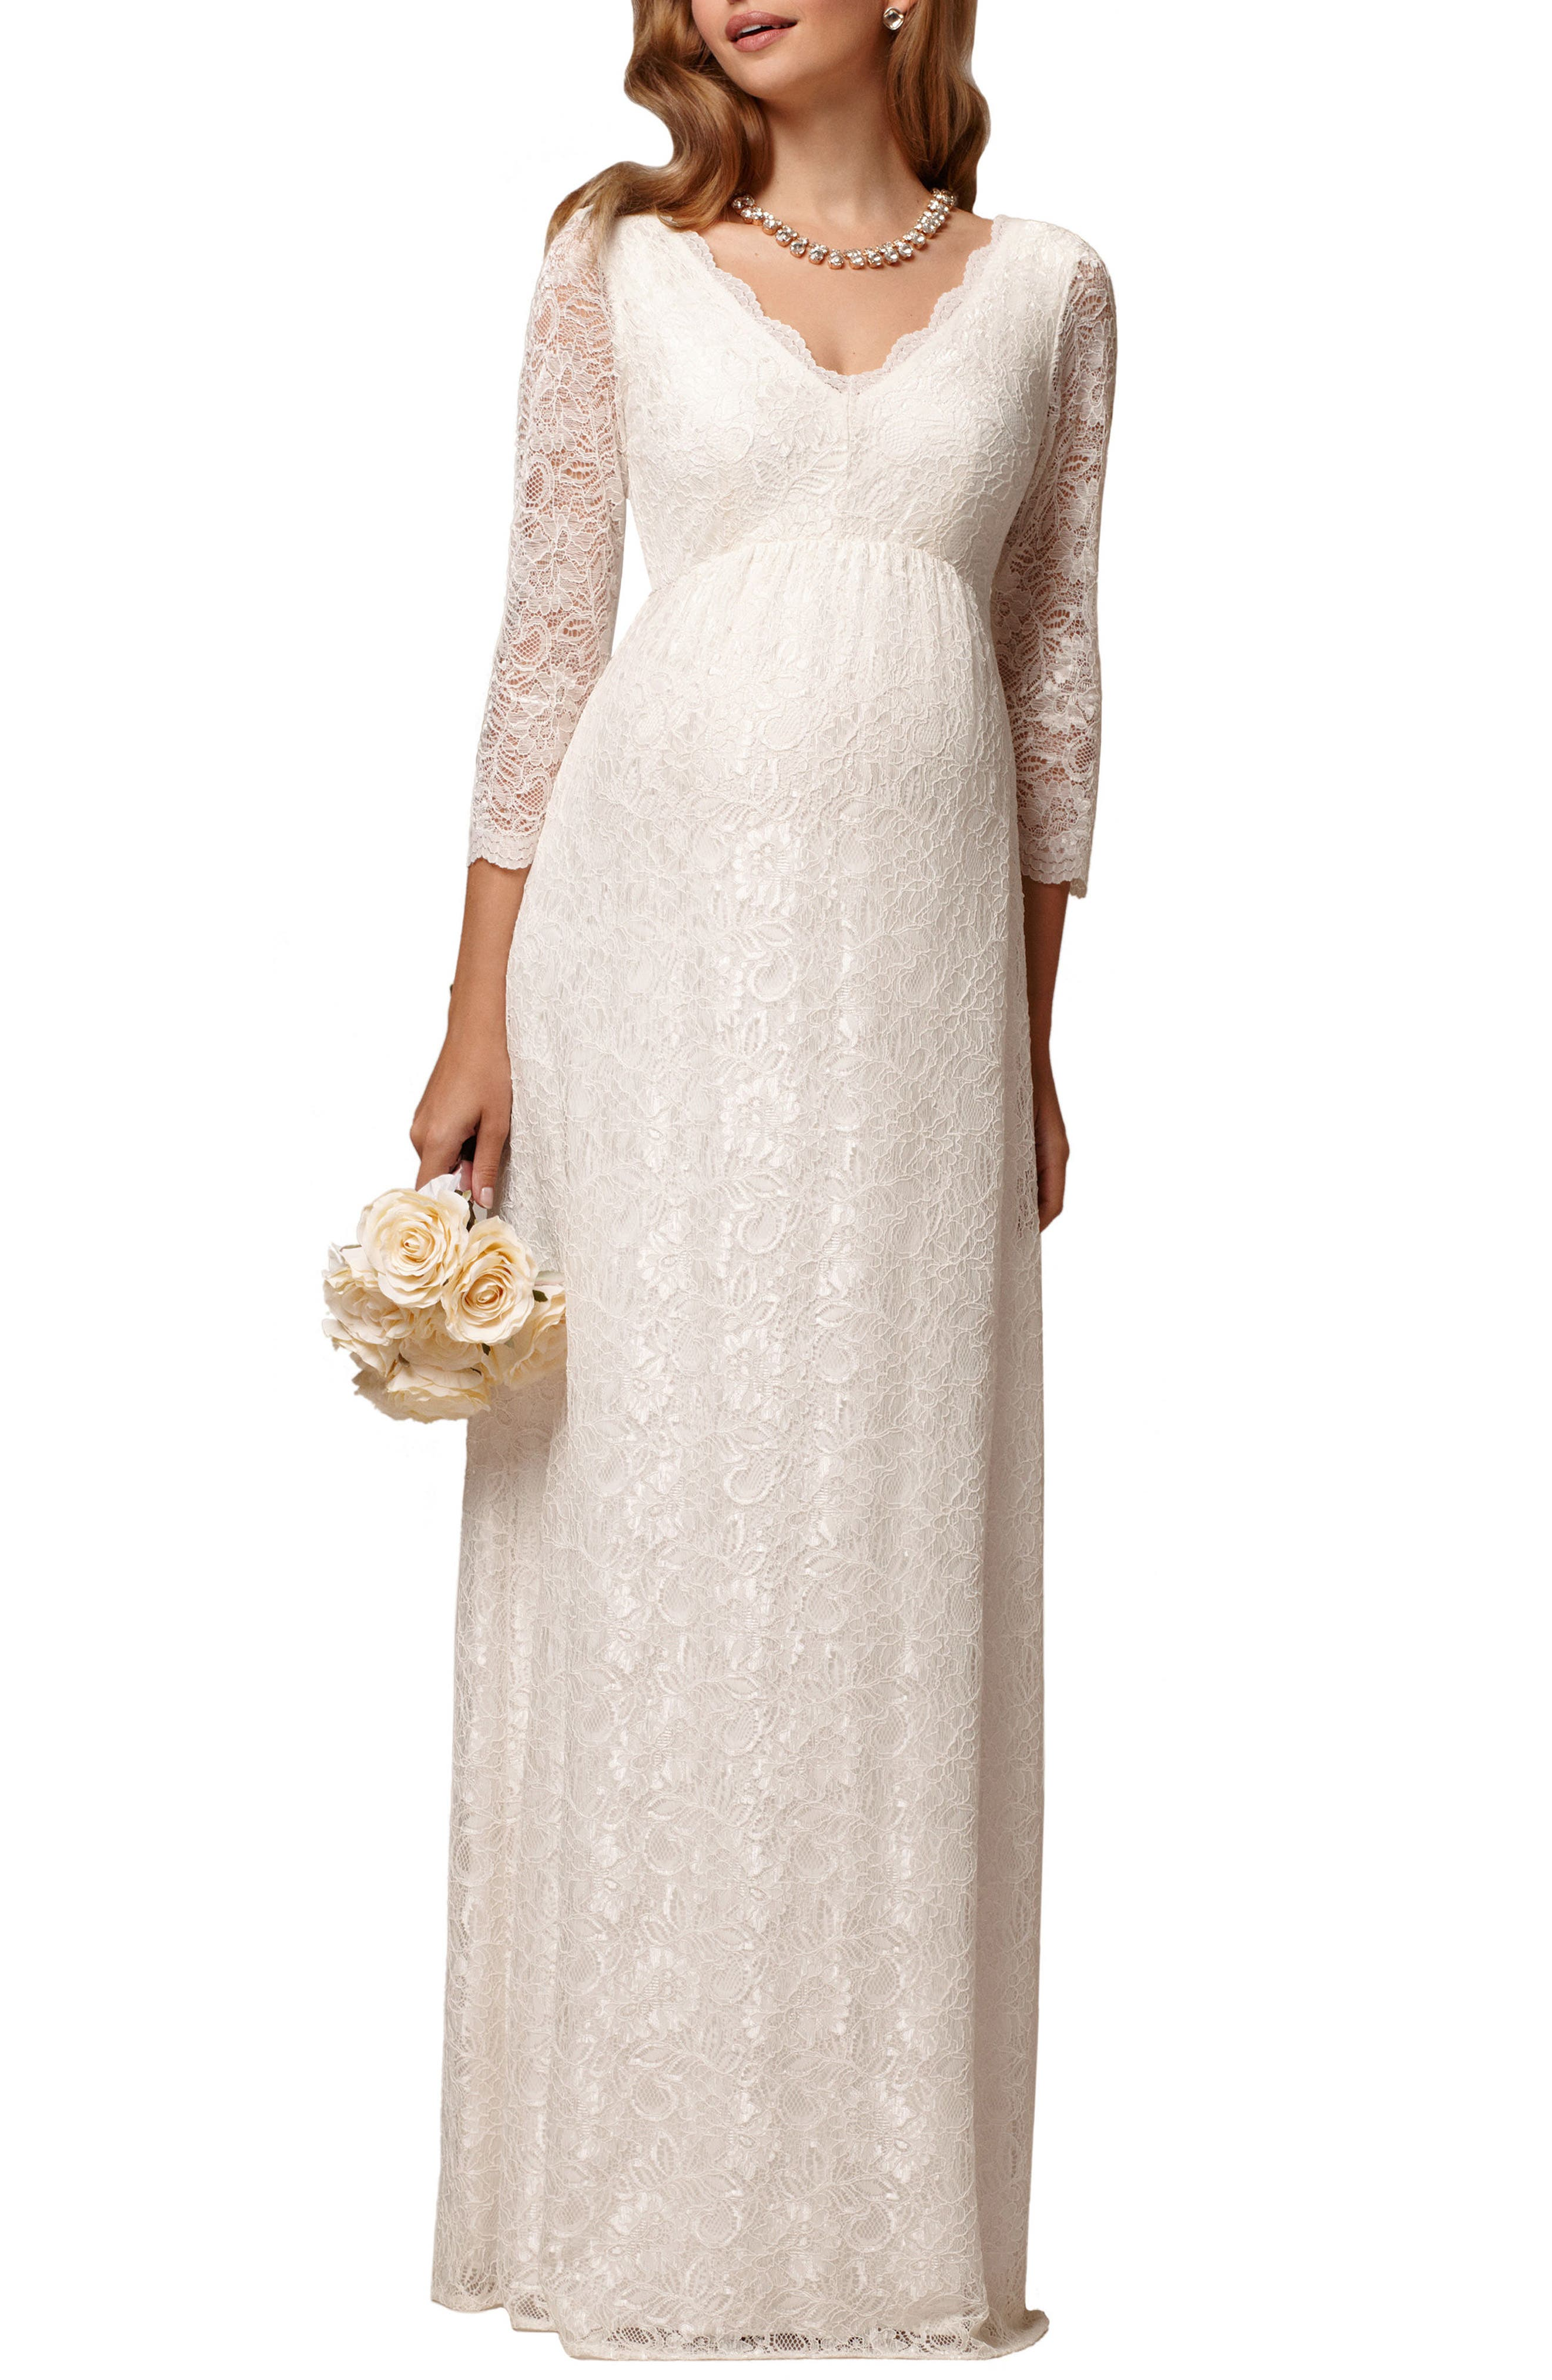 All White Maternity Dress